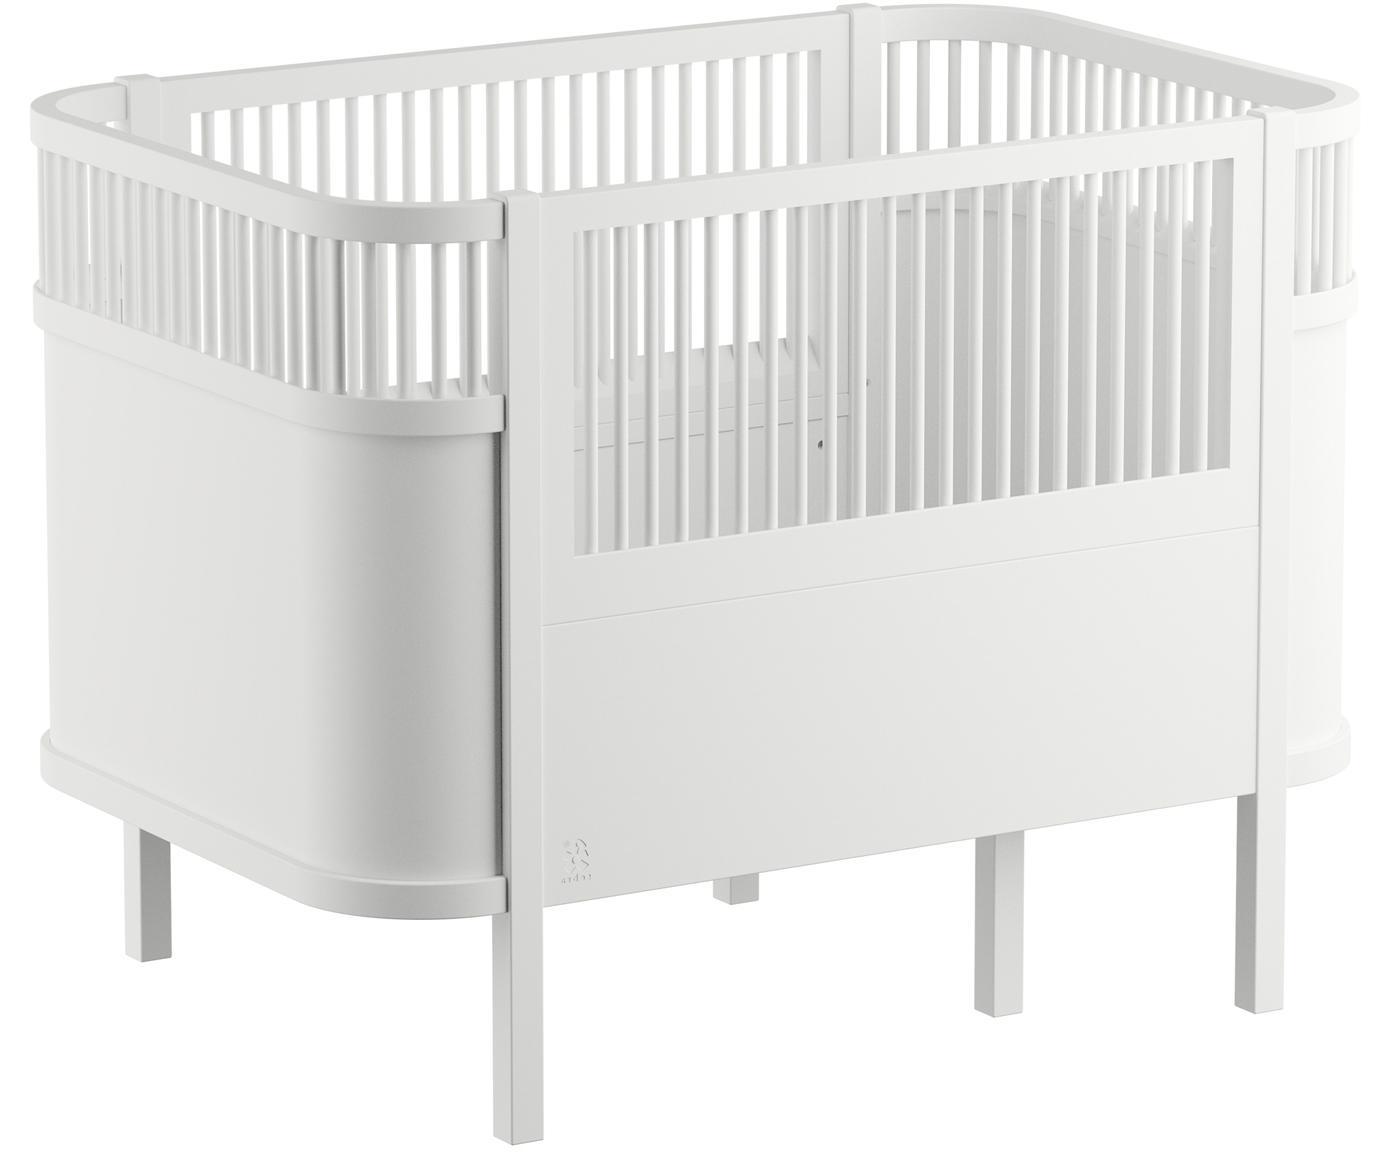 Babybed Junior, Gelakt berkenhout, Wit, 115 x 88 cm